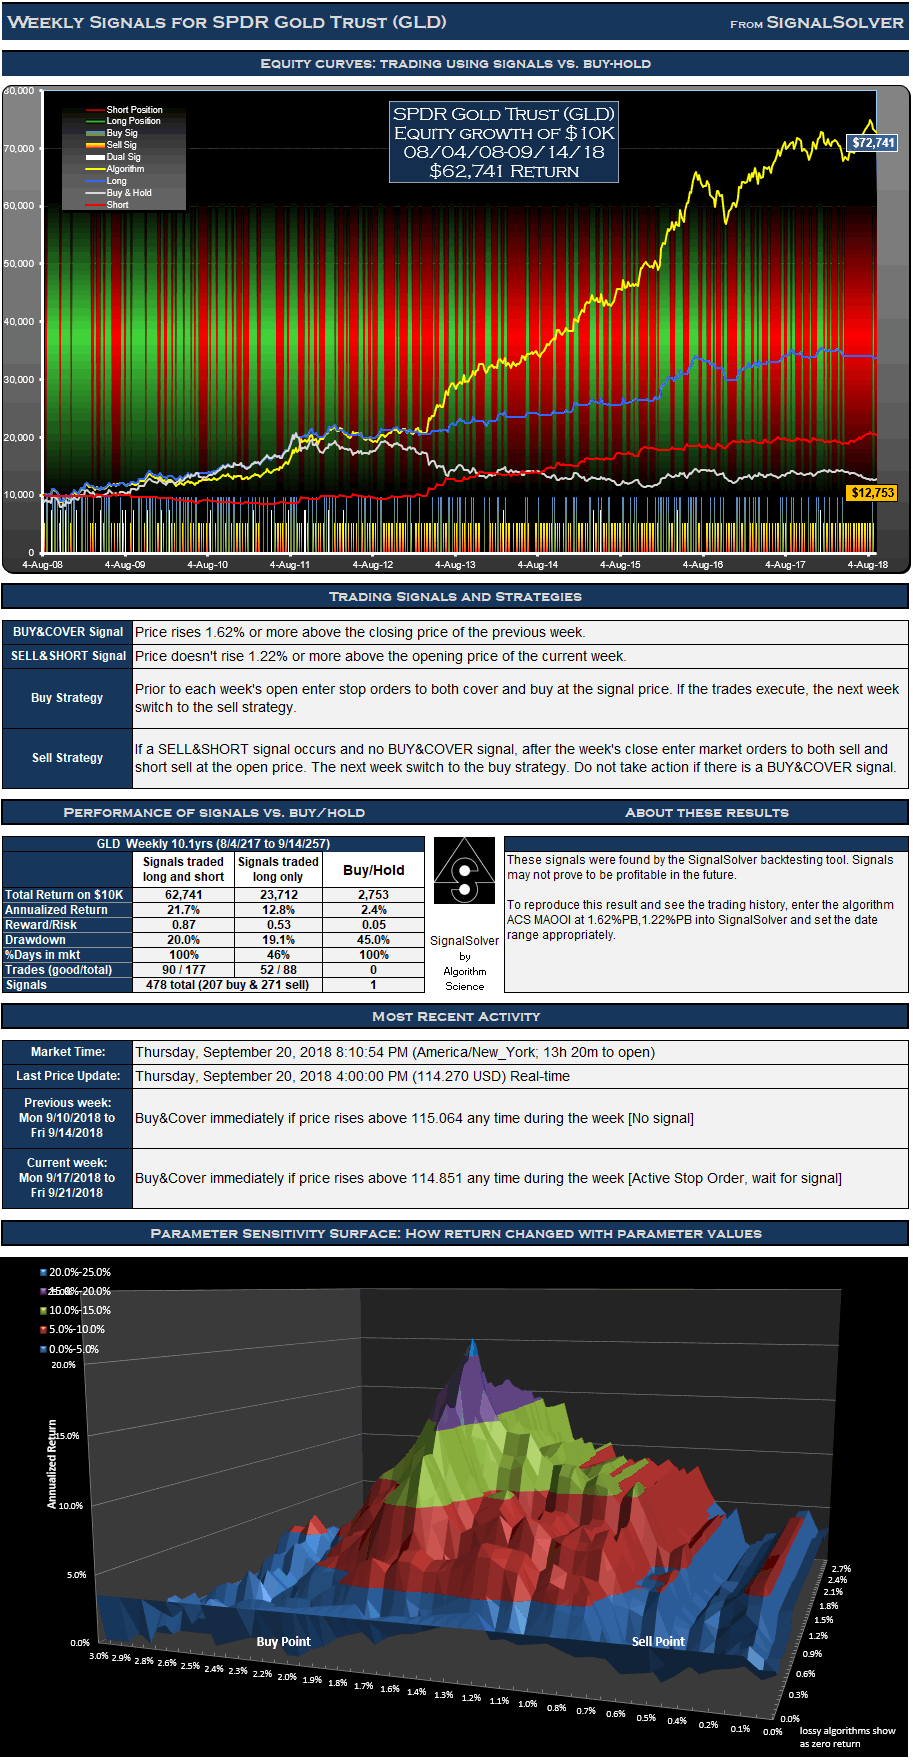 GLD Signals Weekly